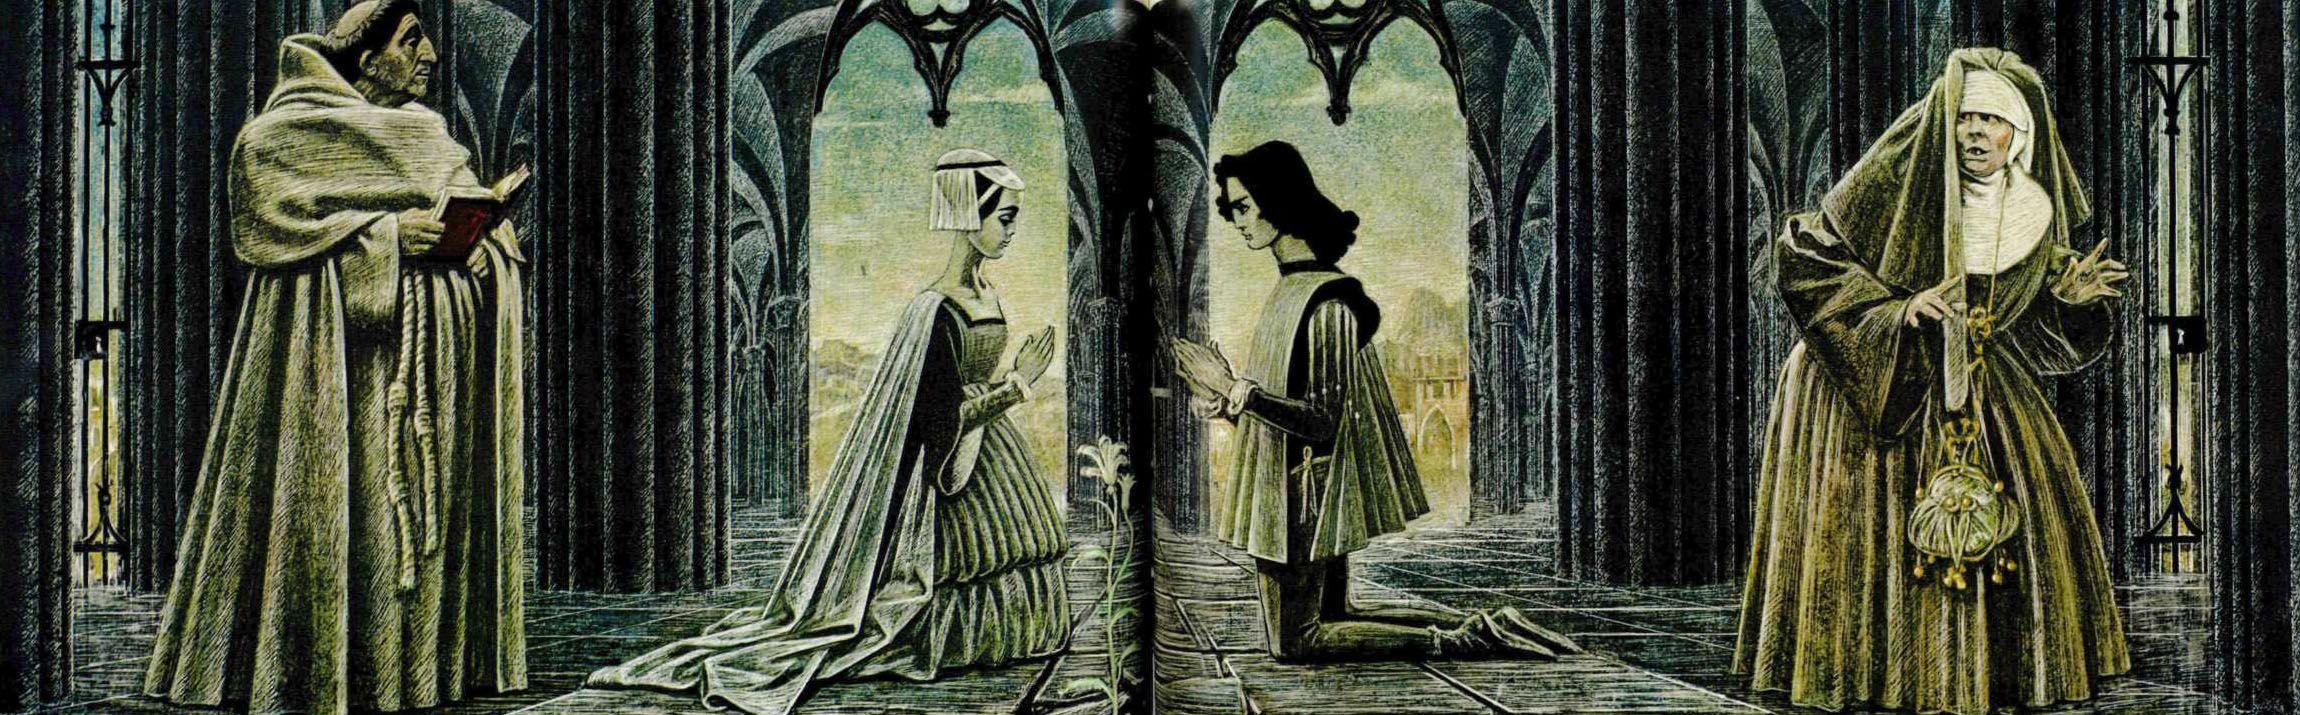 Shakespeare, Romeo and Juliet, Art